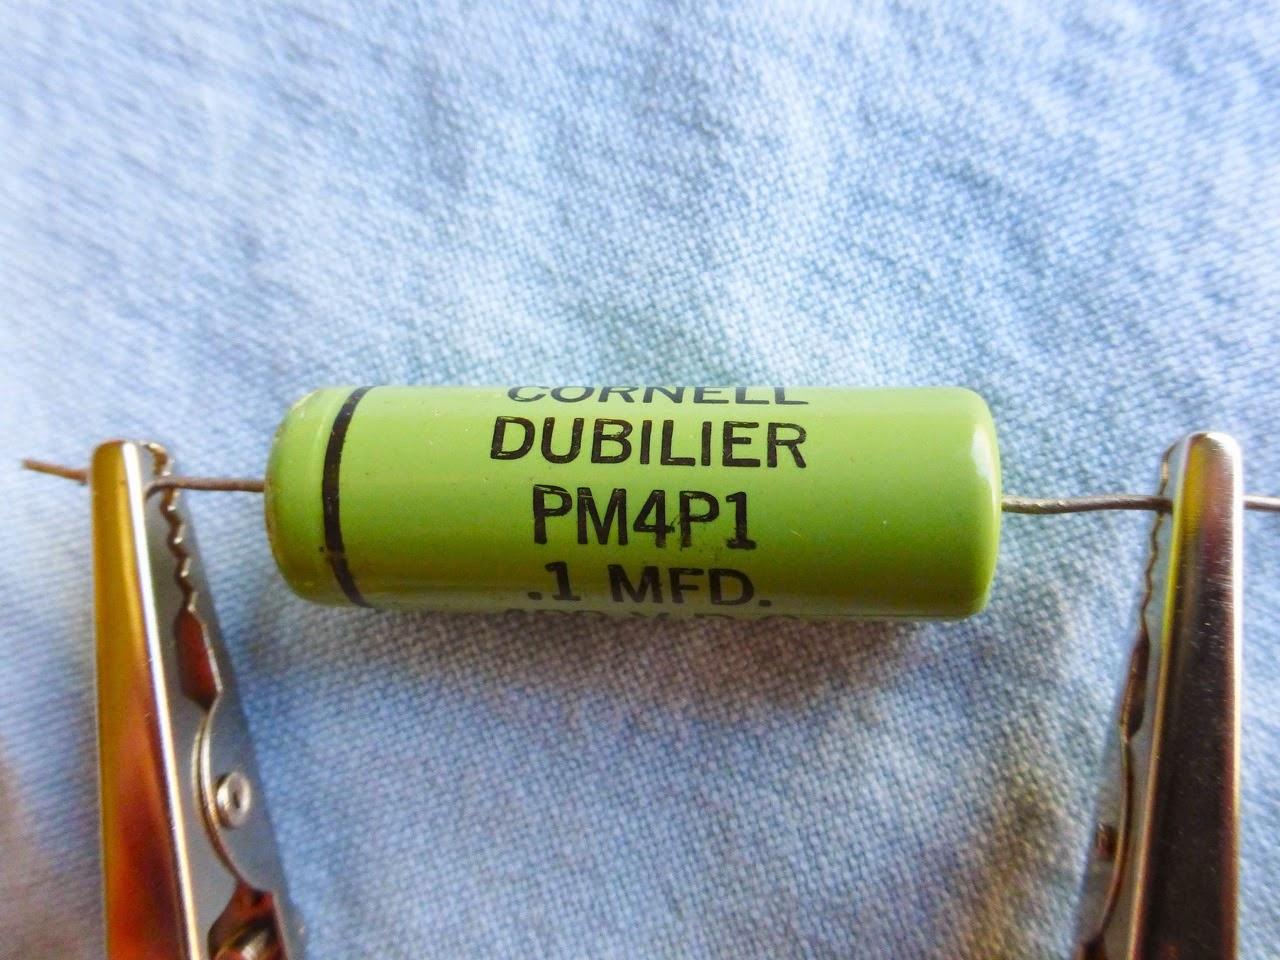 Cornell Dubilier, .1uF, PM4P1, 400 V.D.C., vintage tone, cap, Hammond organ, clips